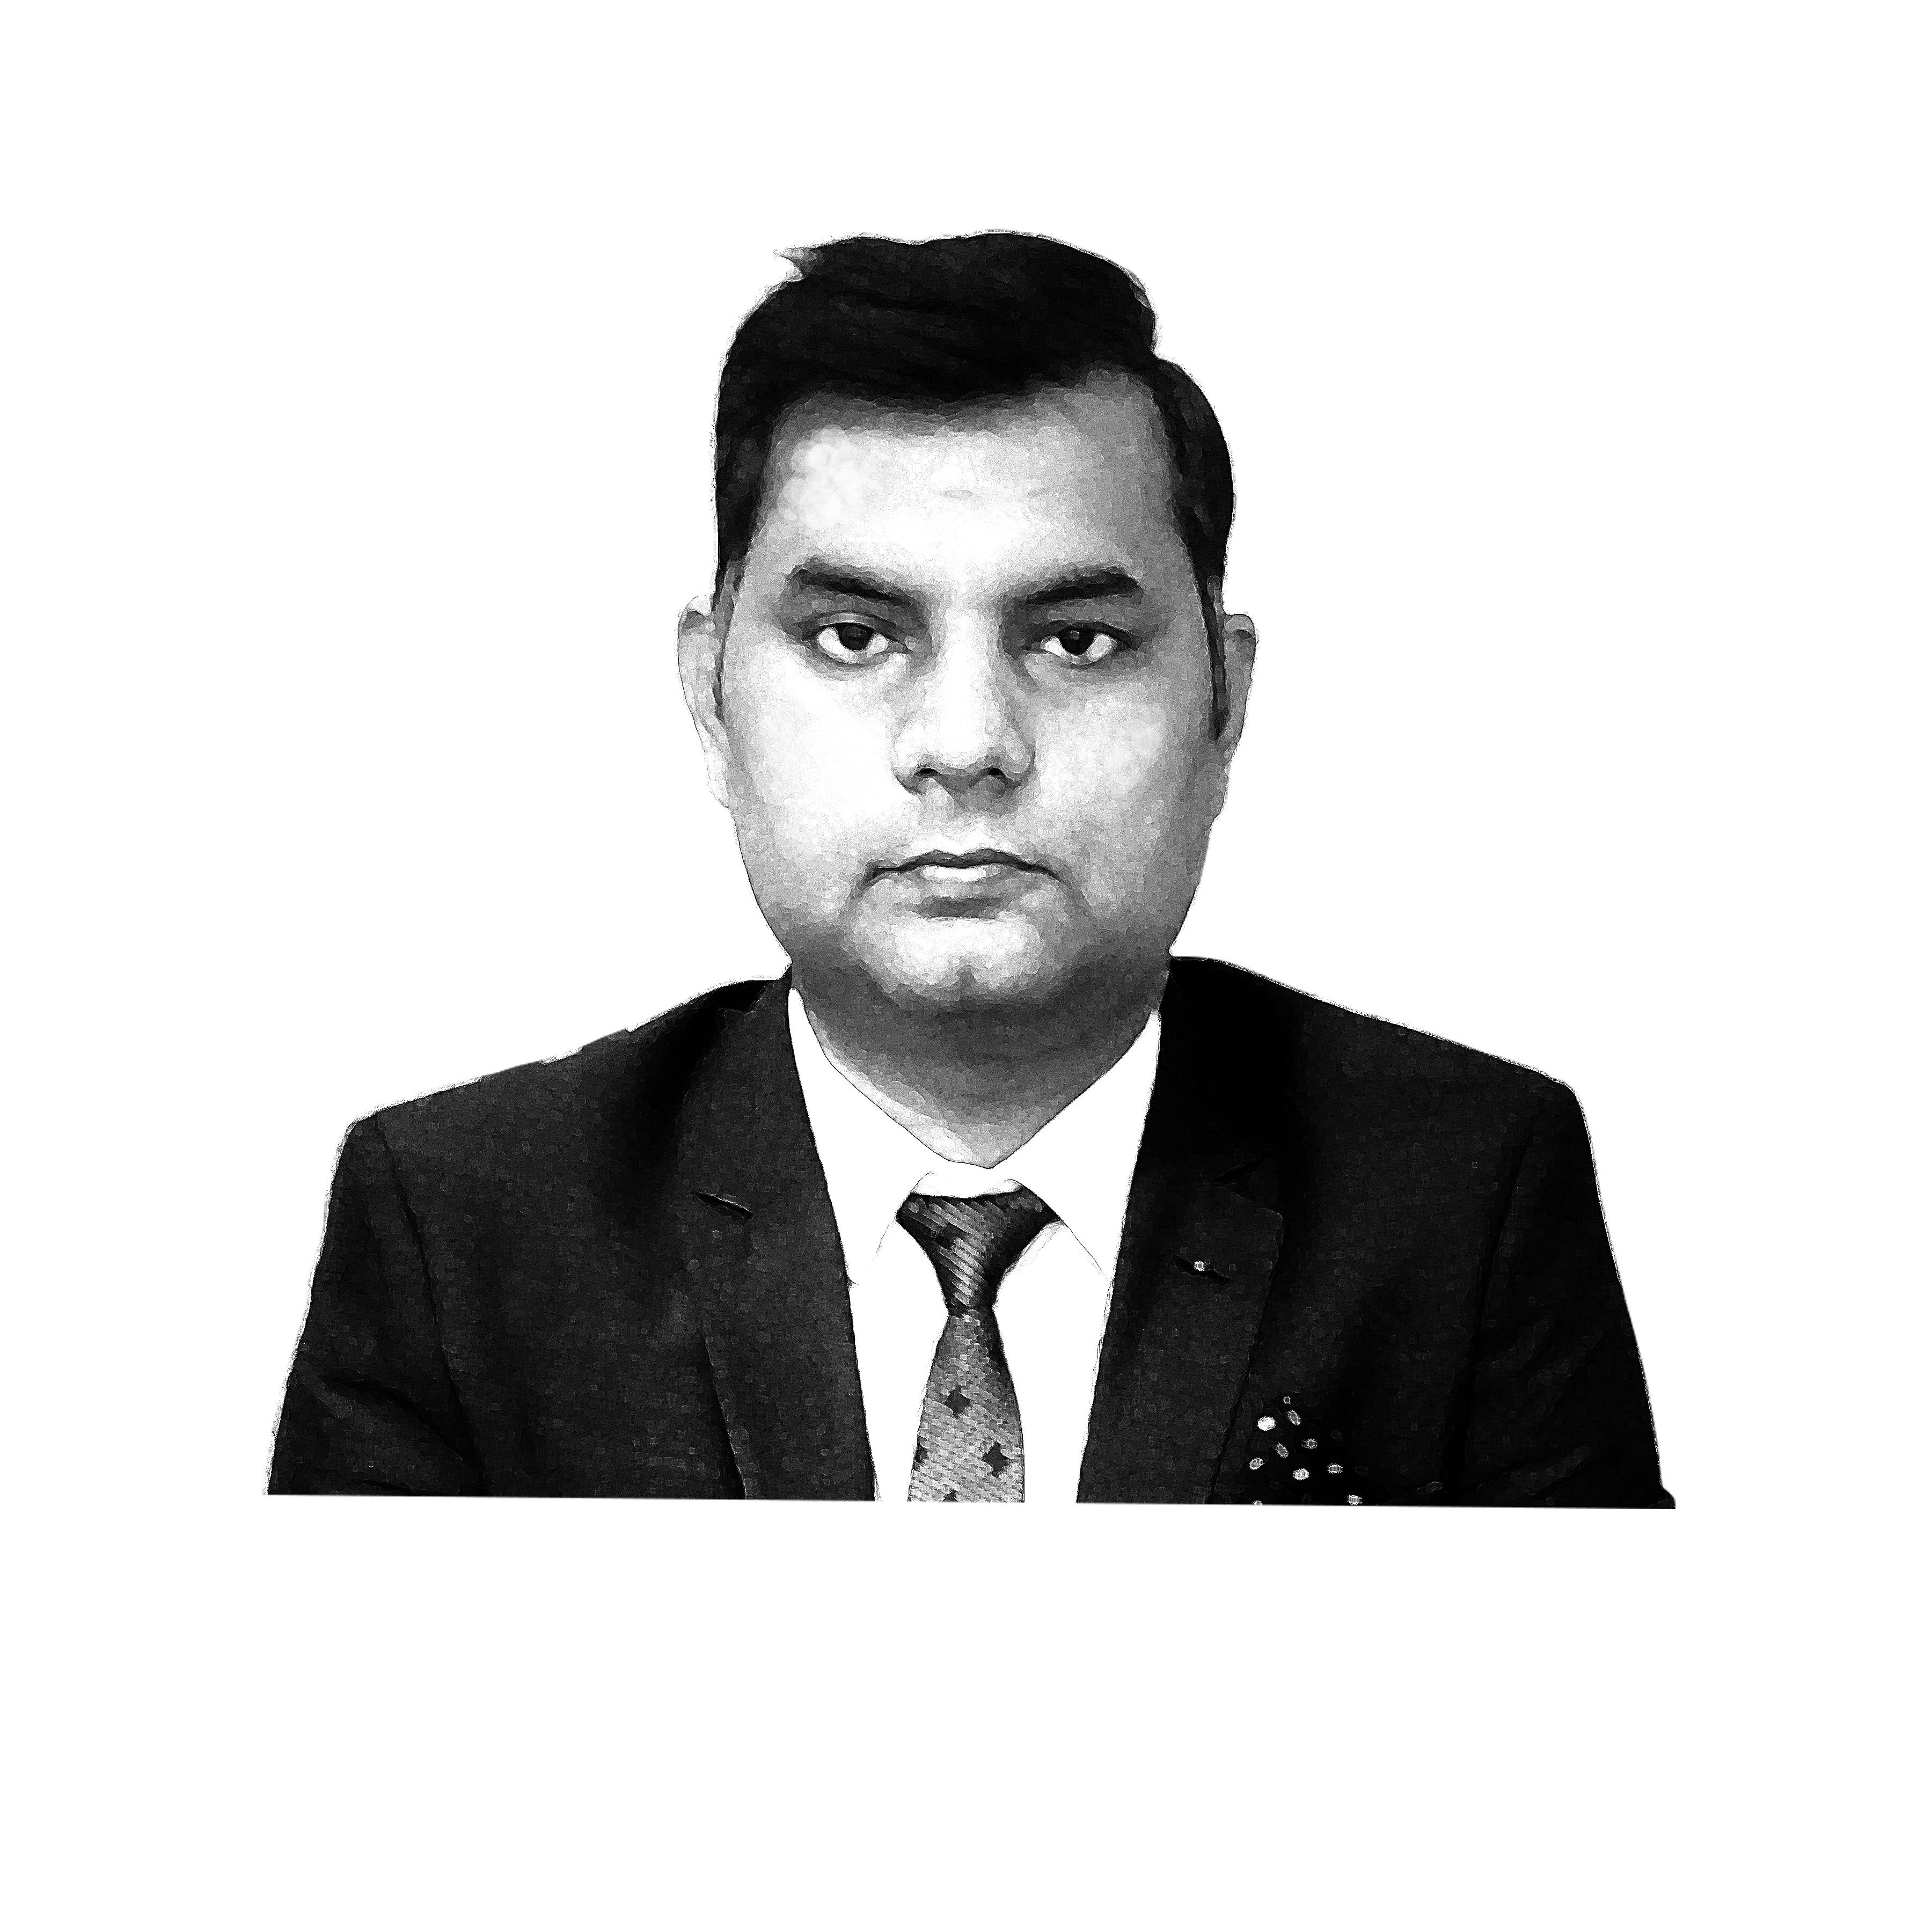 Chitranjan Kumar